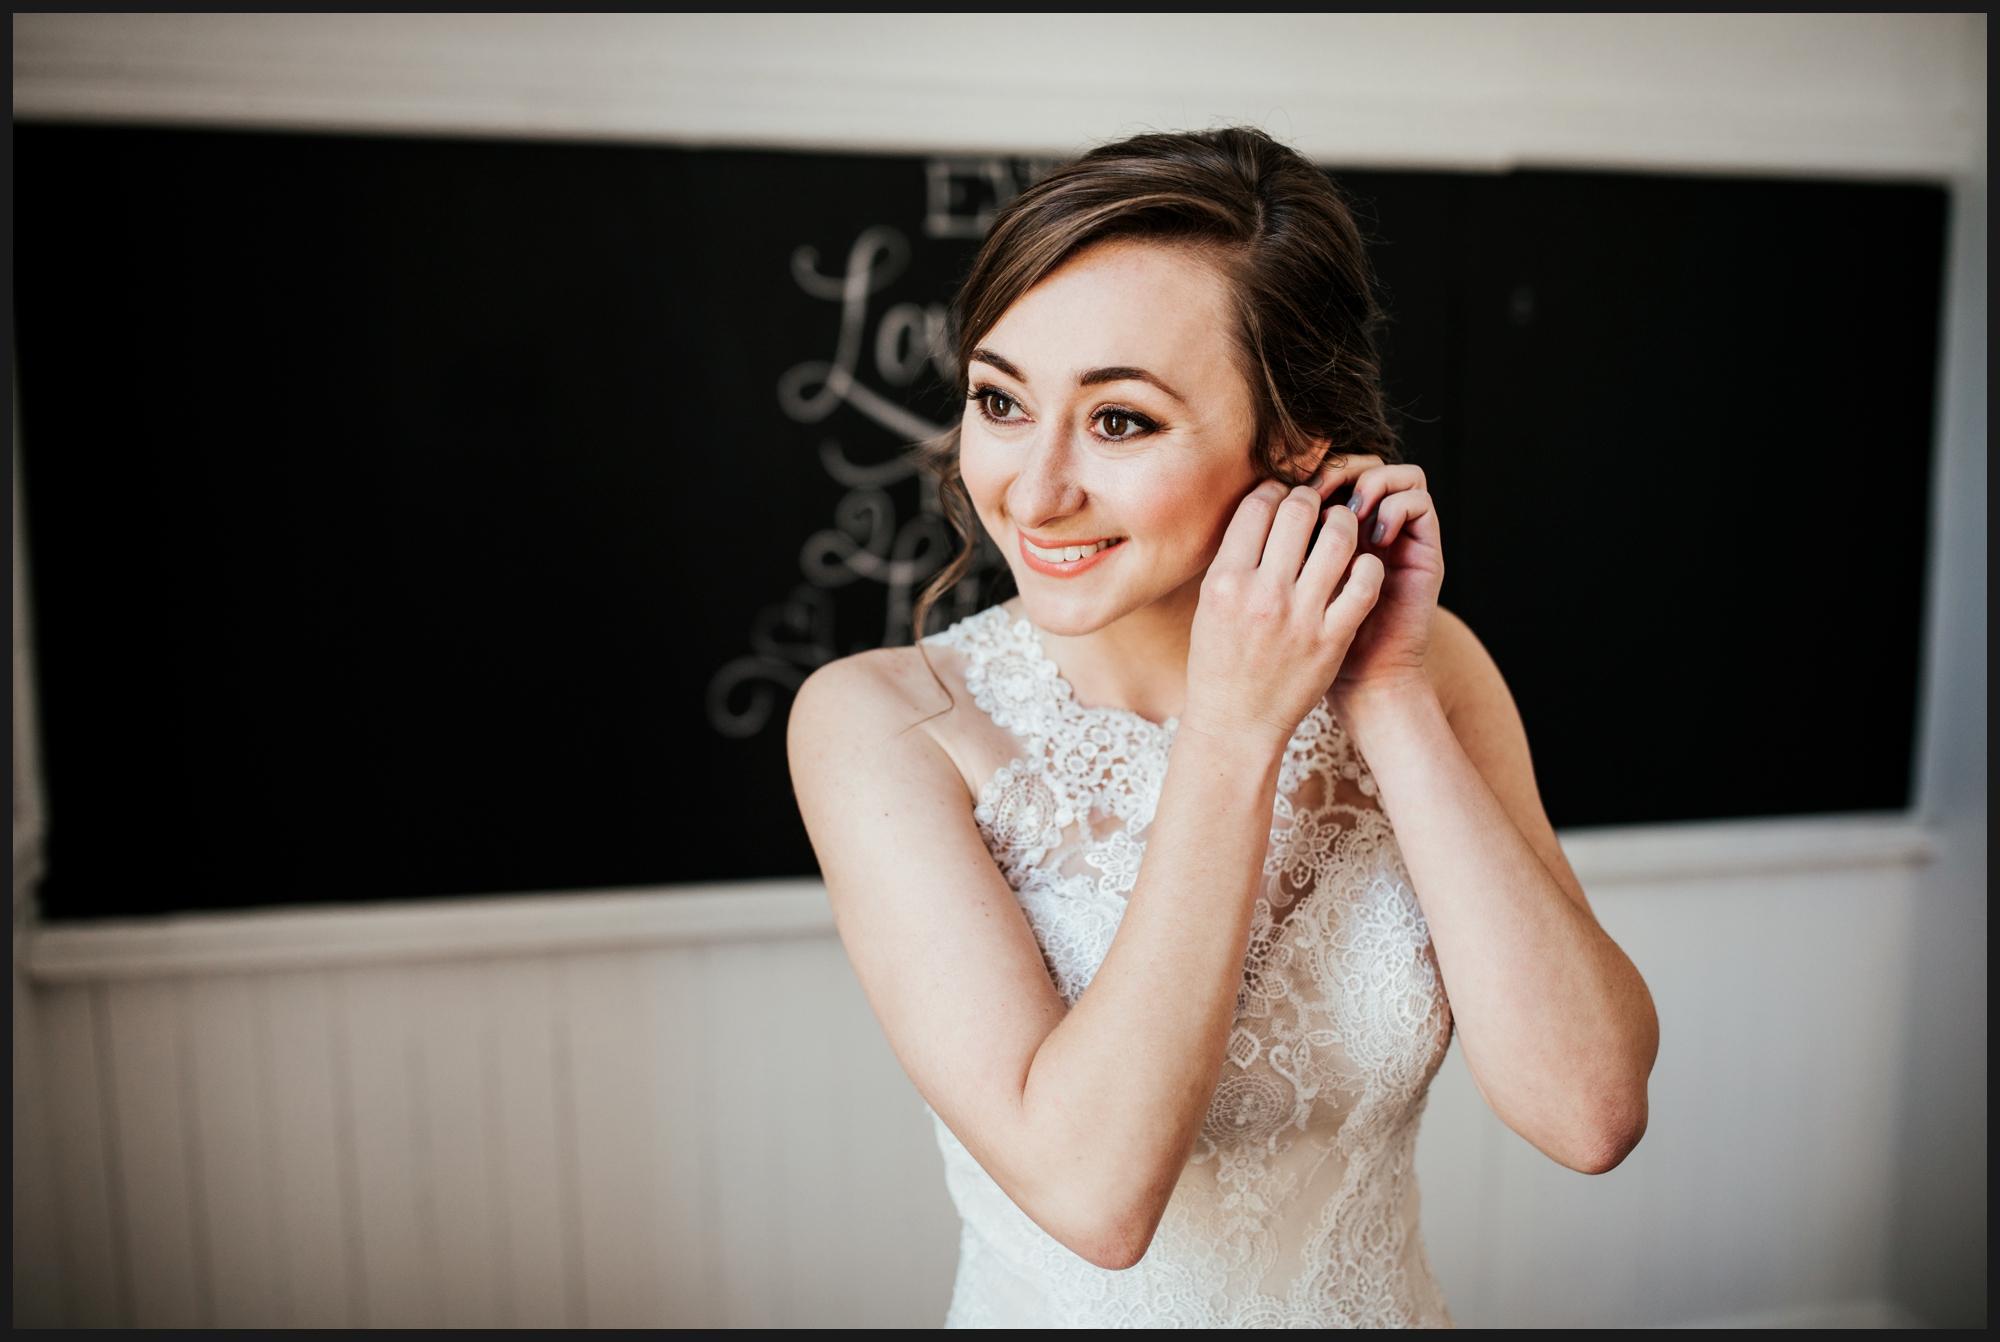 Orlando-Wedding-Photographer-destination-wedding-photographer-florida-wedding-photographer-bohemian-wedding-photographer_1723.jpg